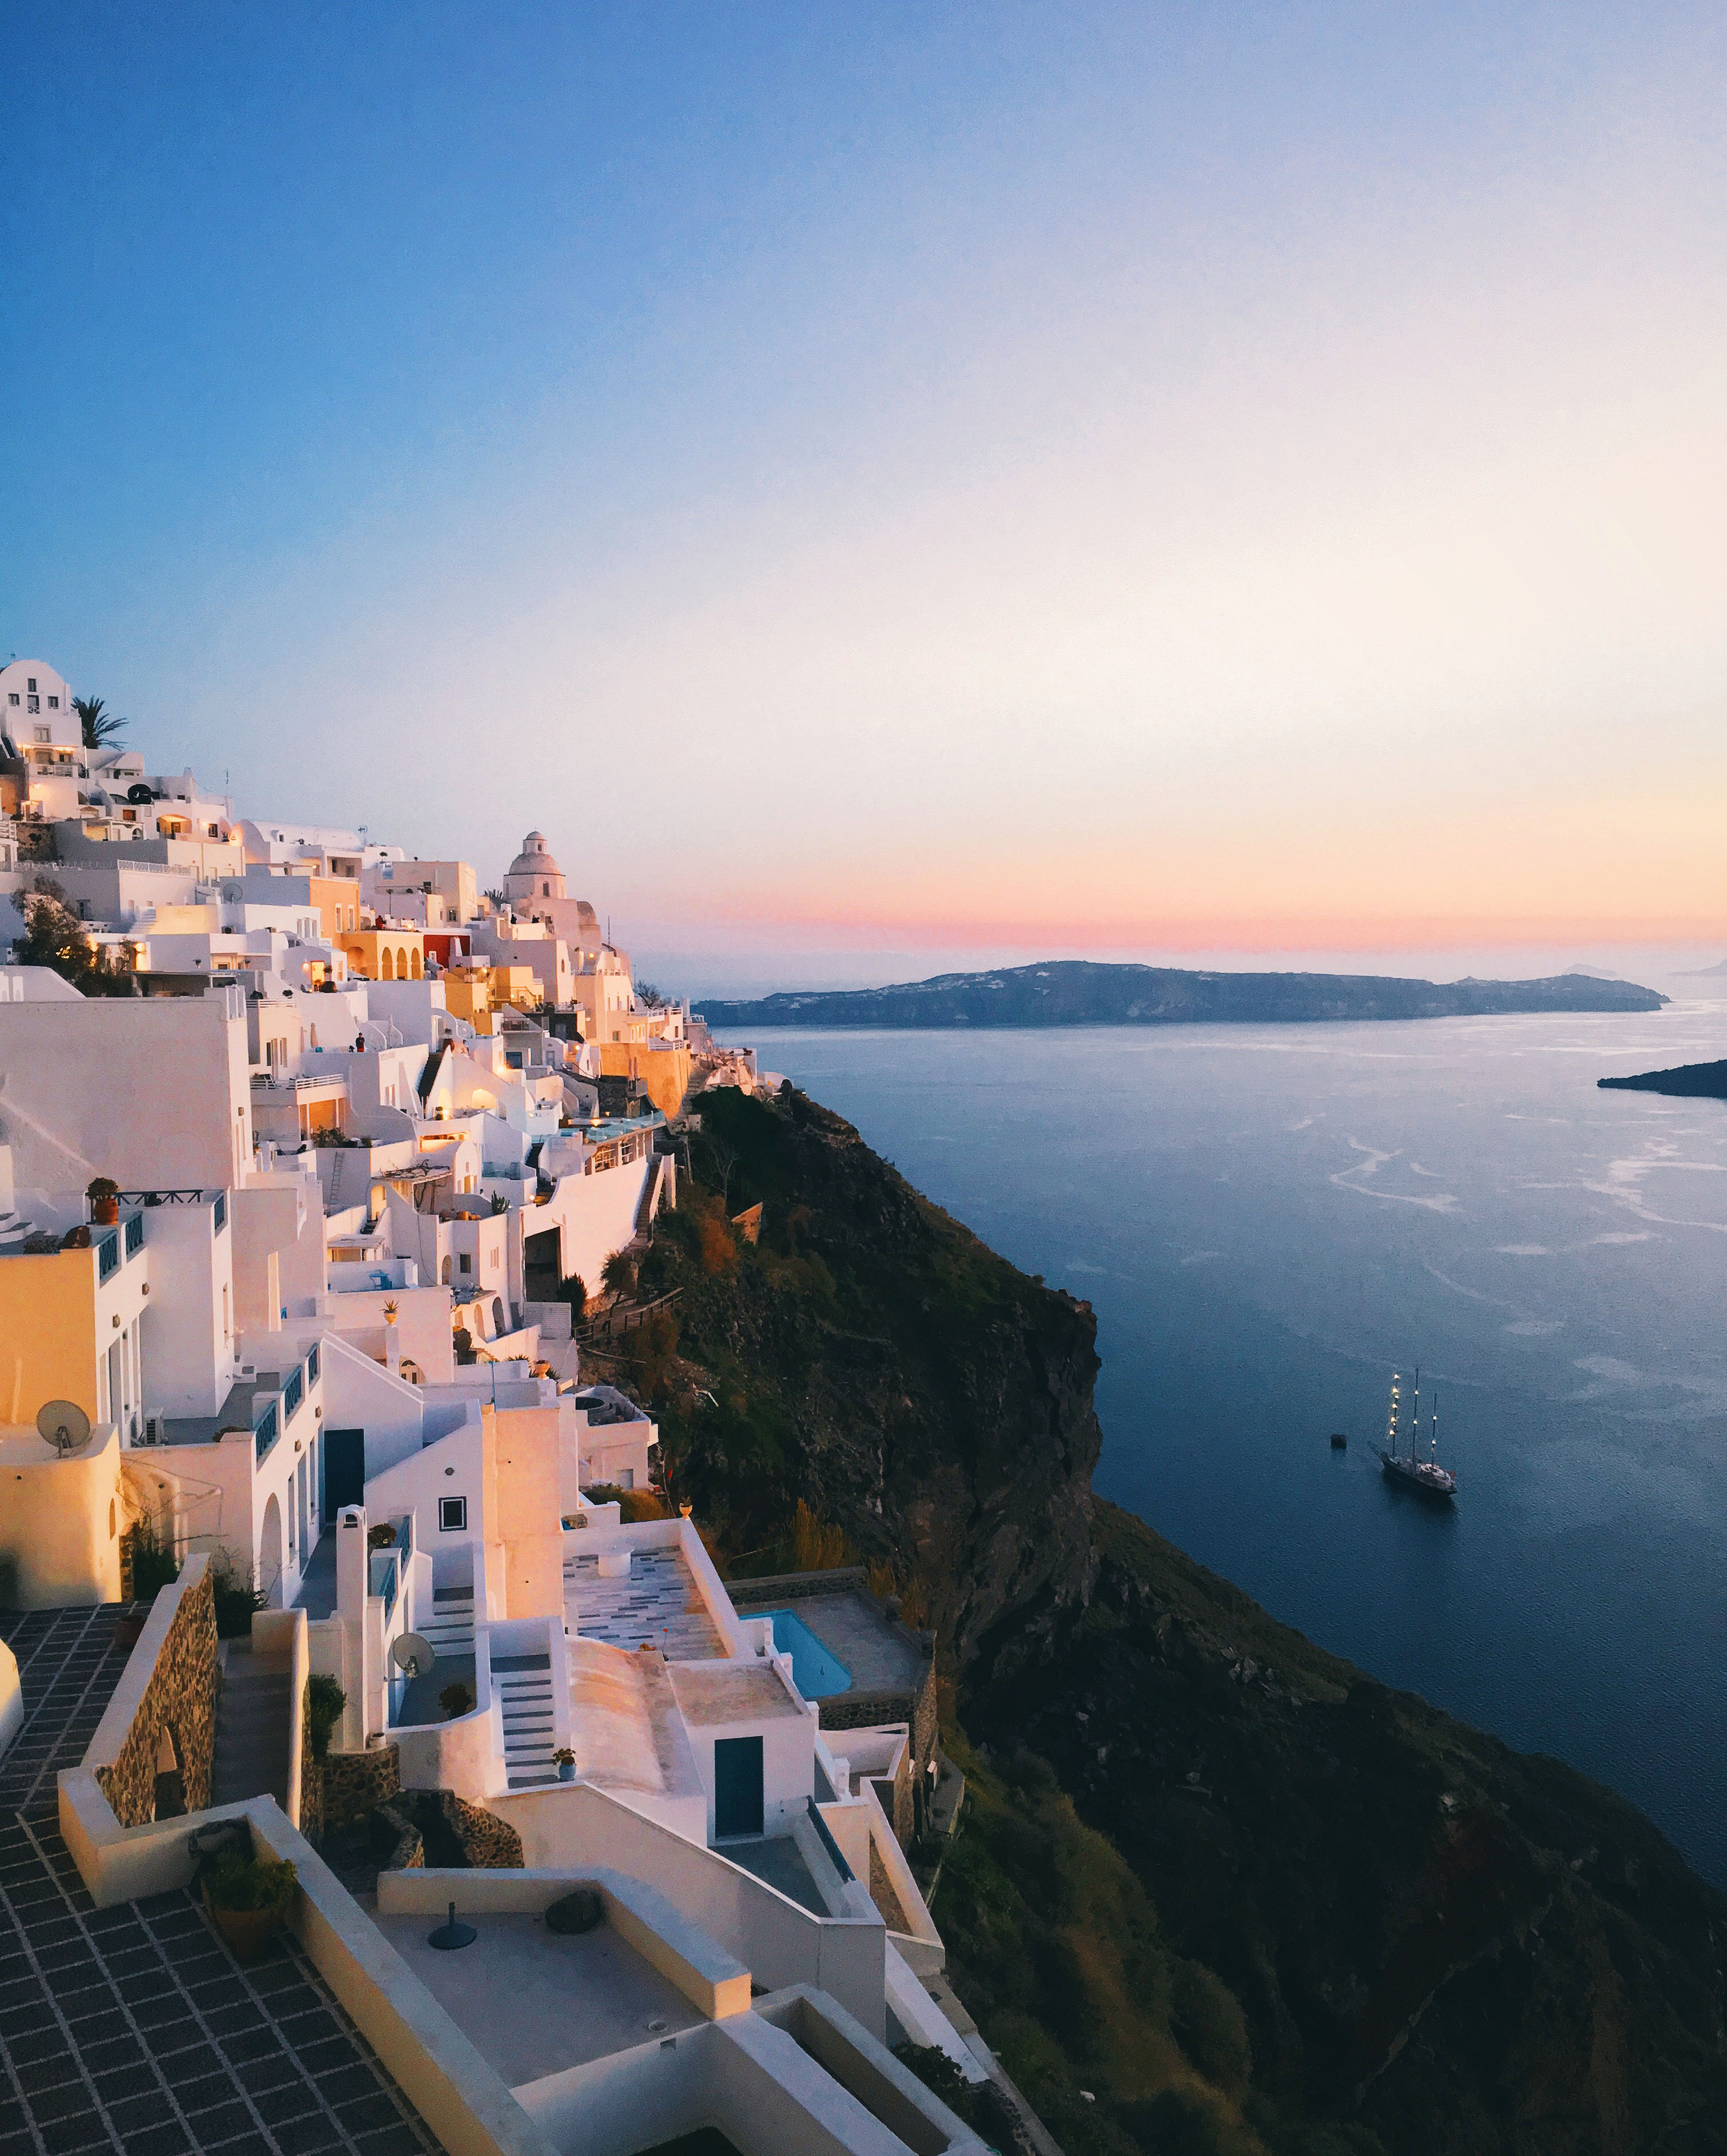 santorini greece travel photo